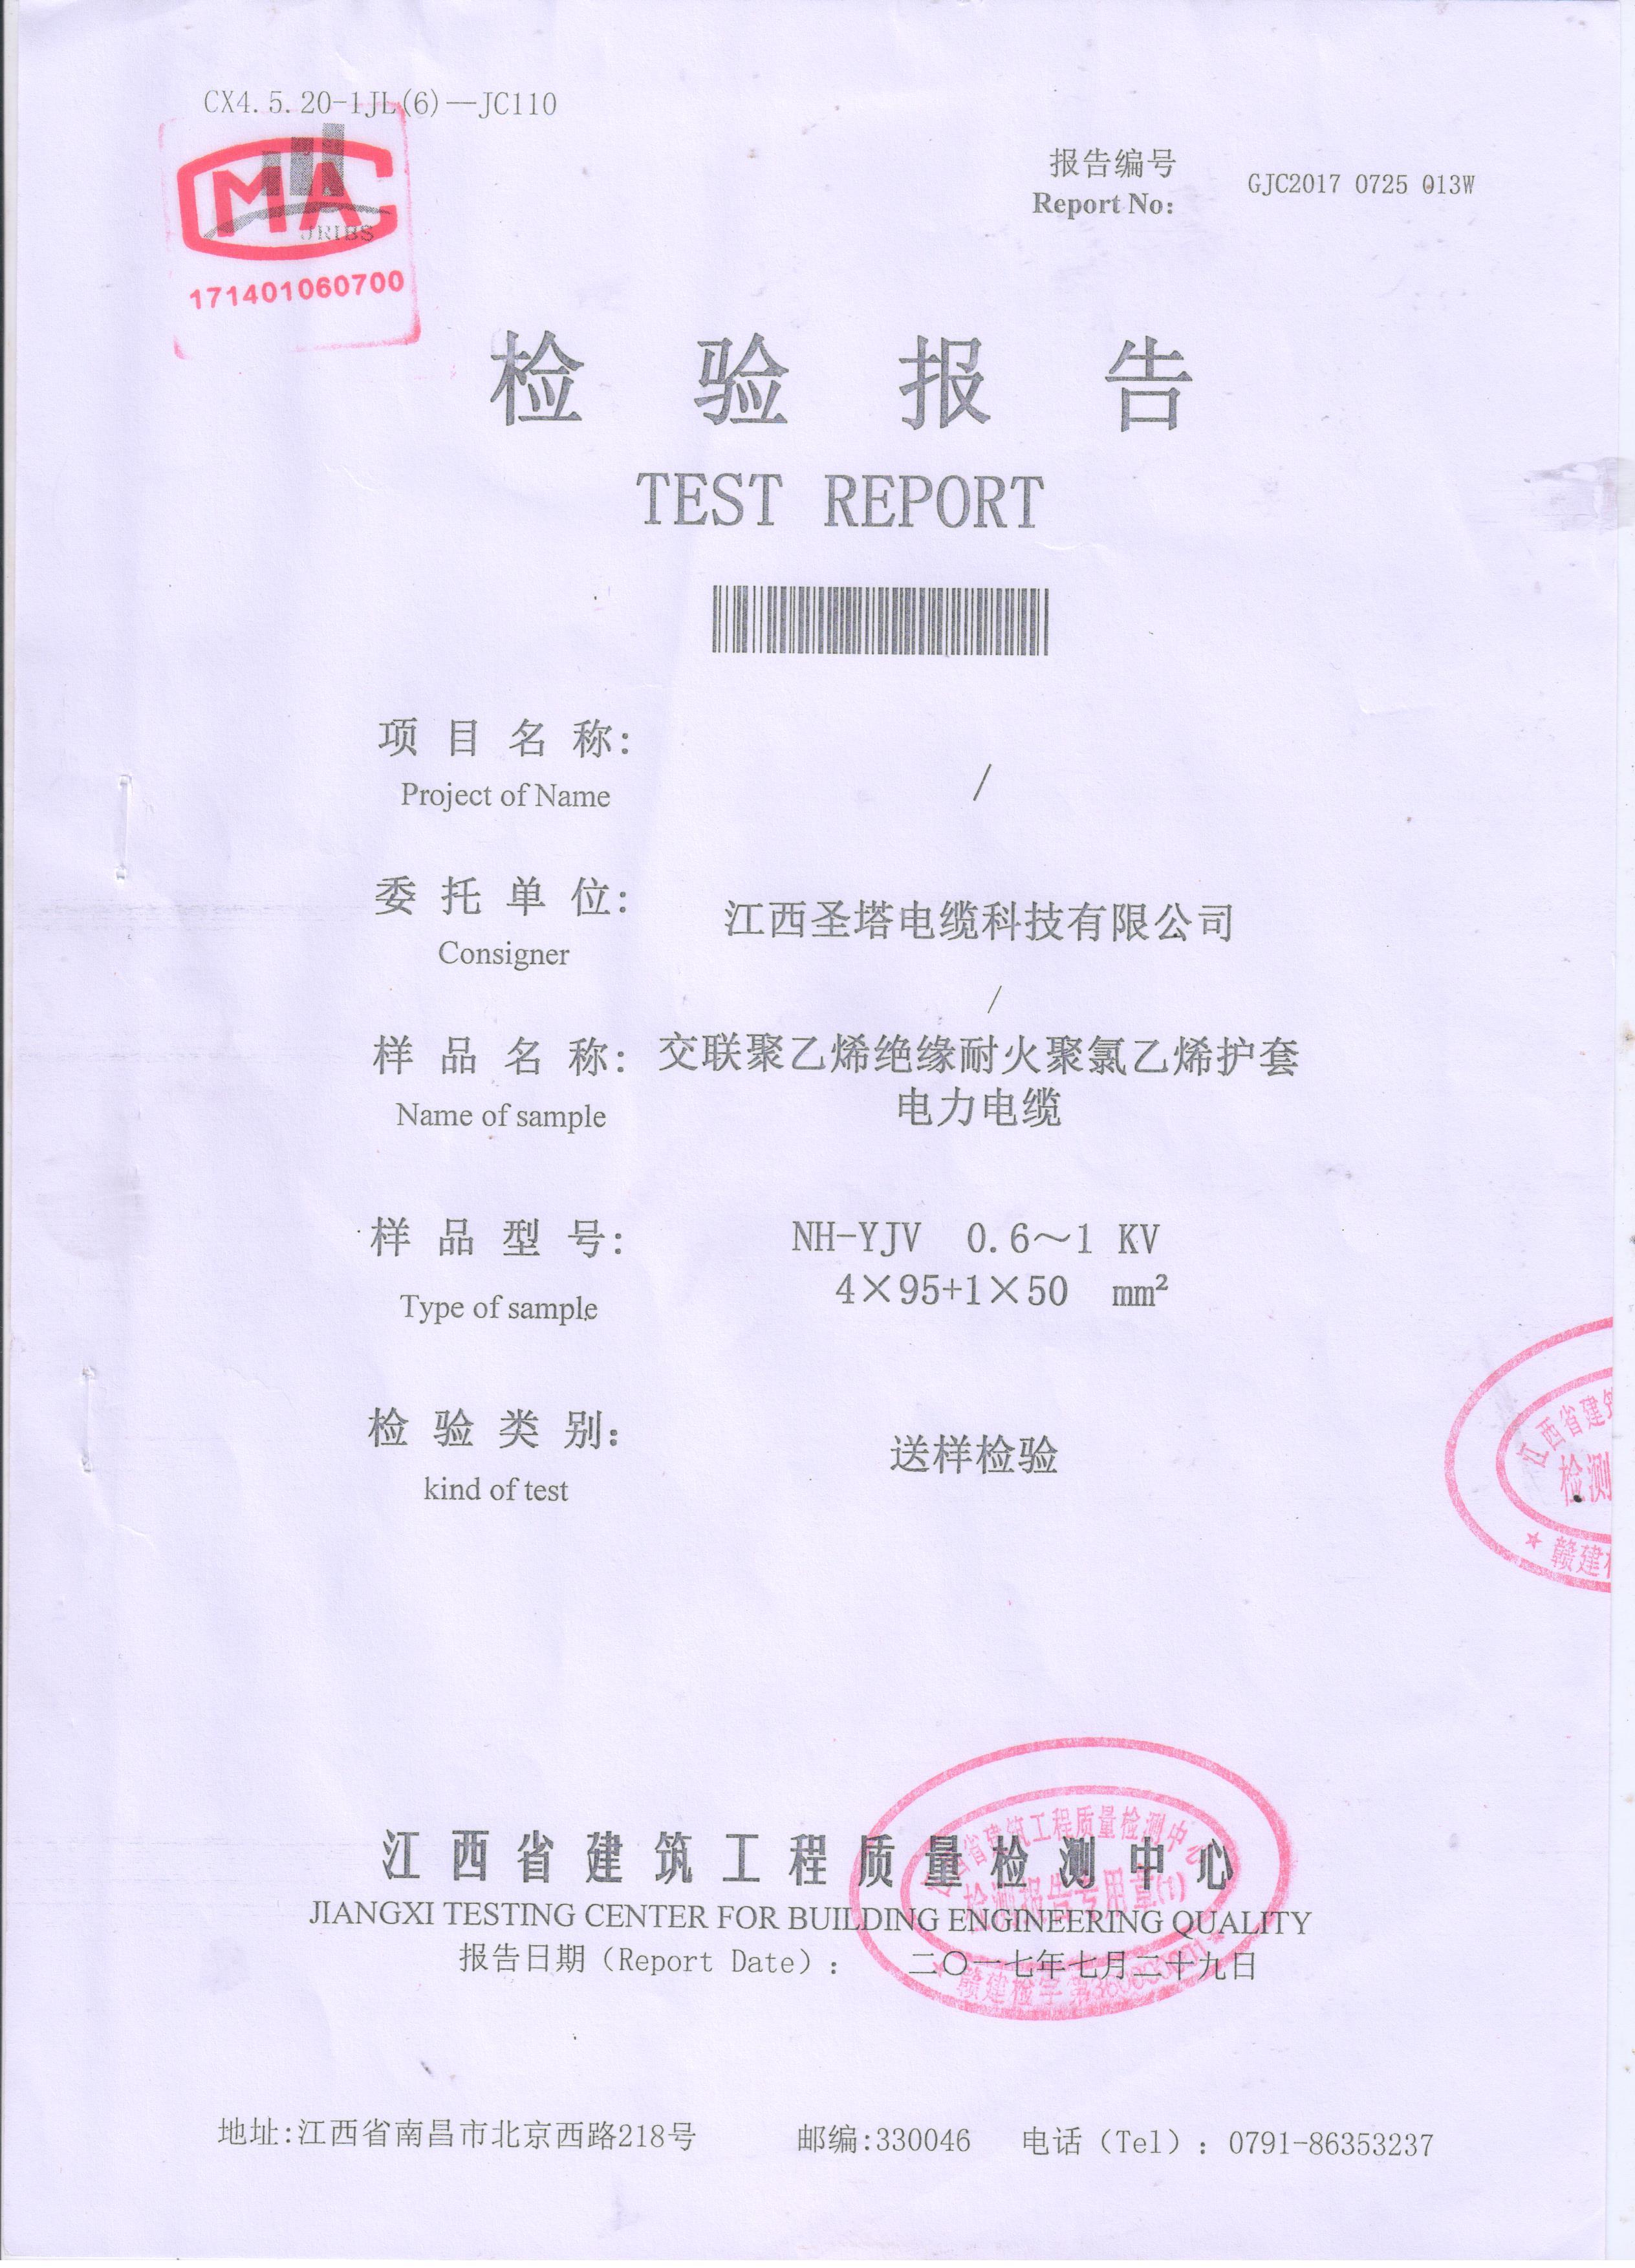 NH-YJV-3X95+2X50检测报告1 001.jpg